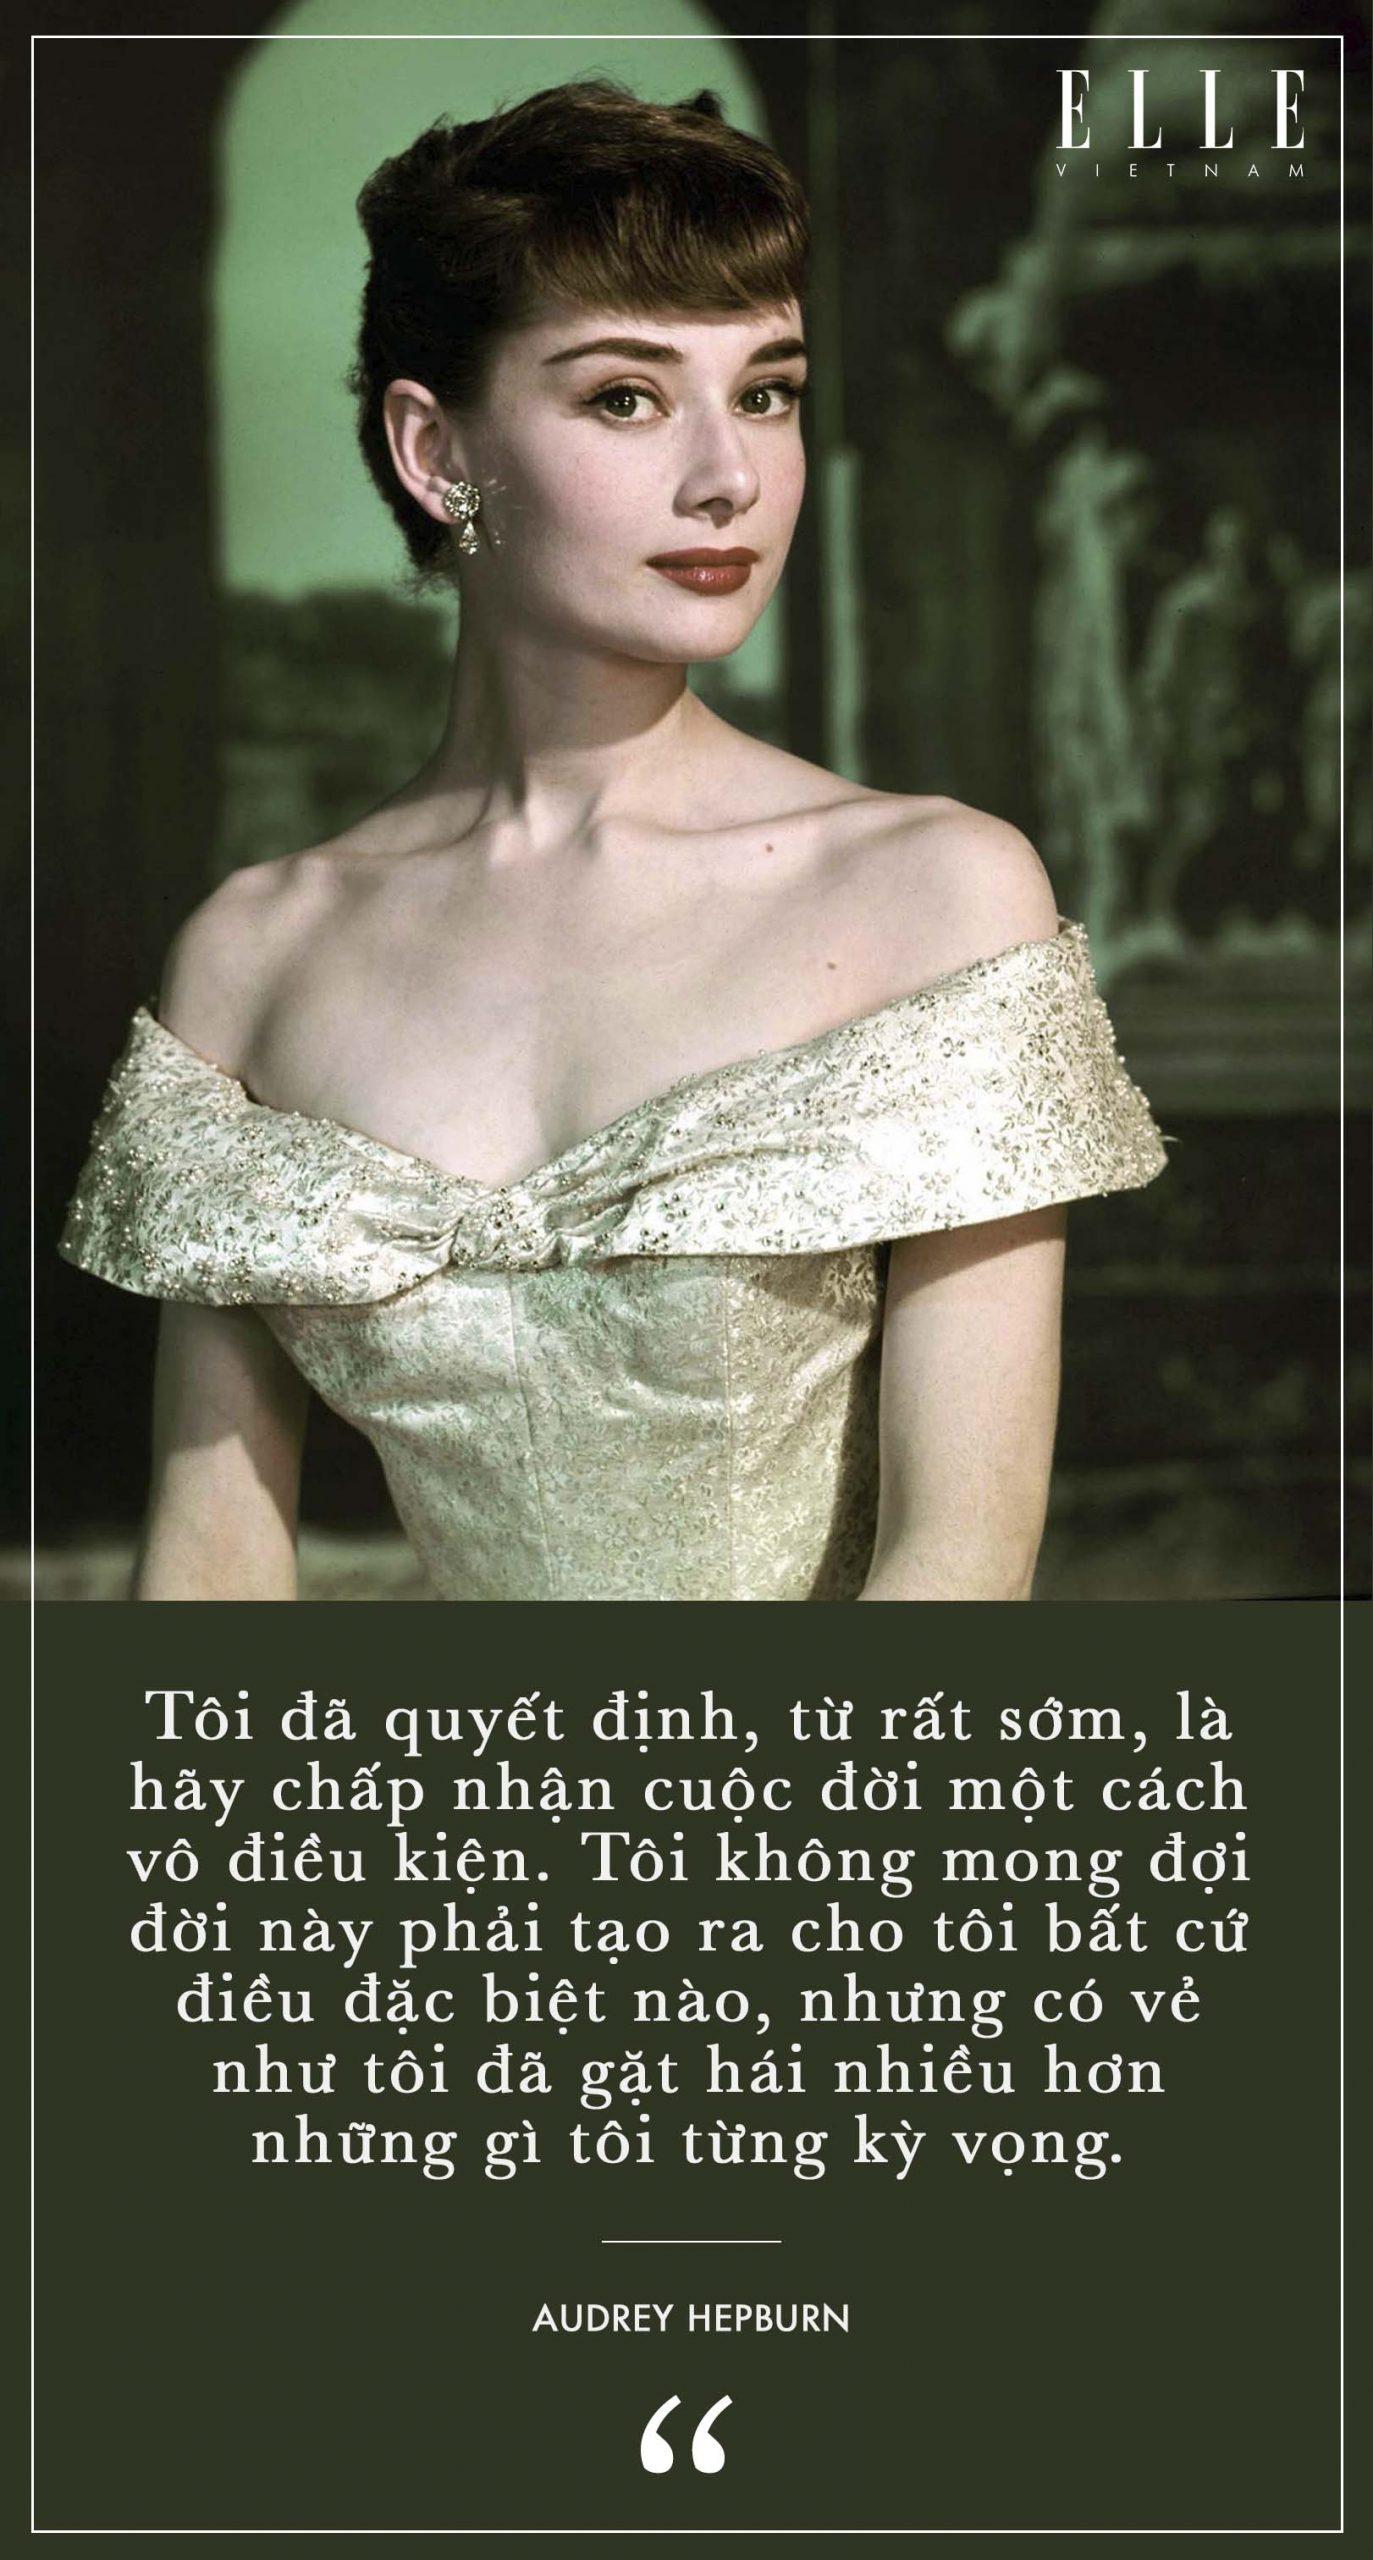 diễn viên Audrey Hepburn 3